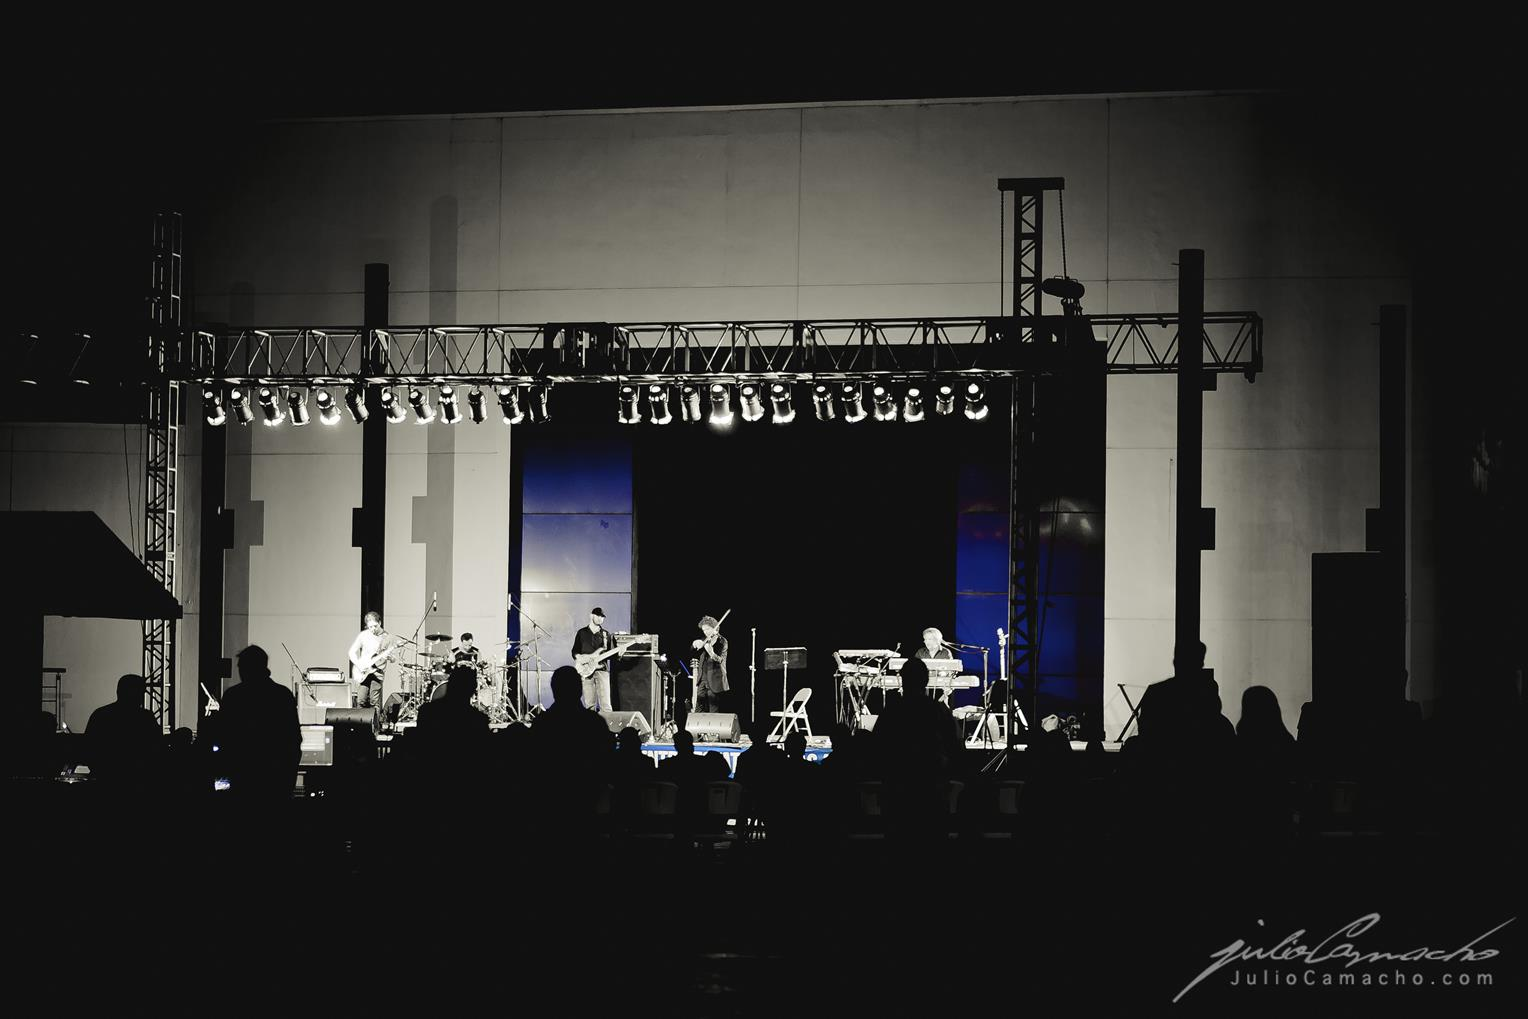 2014-10-30 31 CAST TOUR Ensenada y Tijuana - 0632 - www.Juli (Copy).jpg